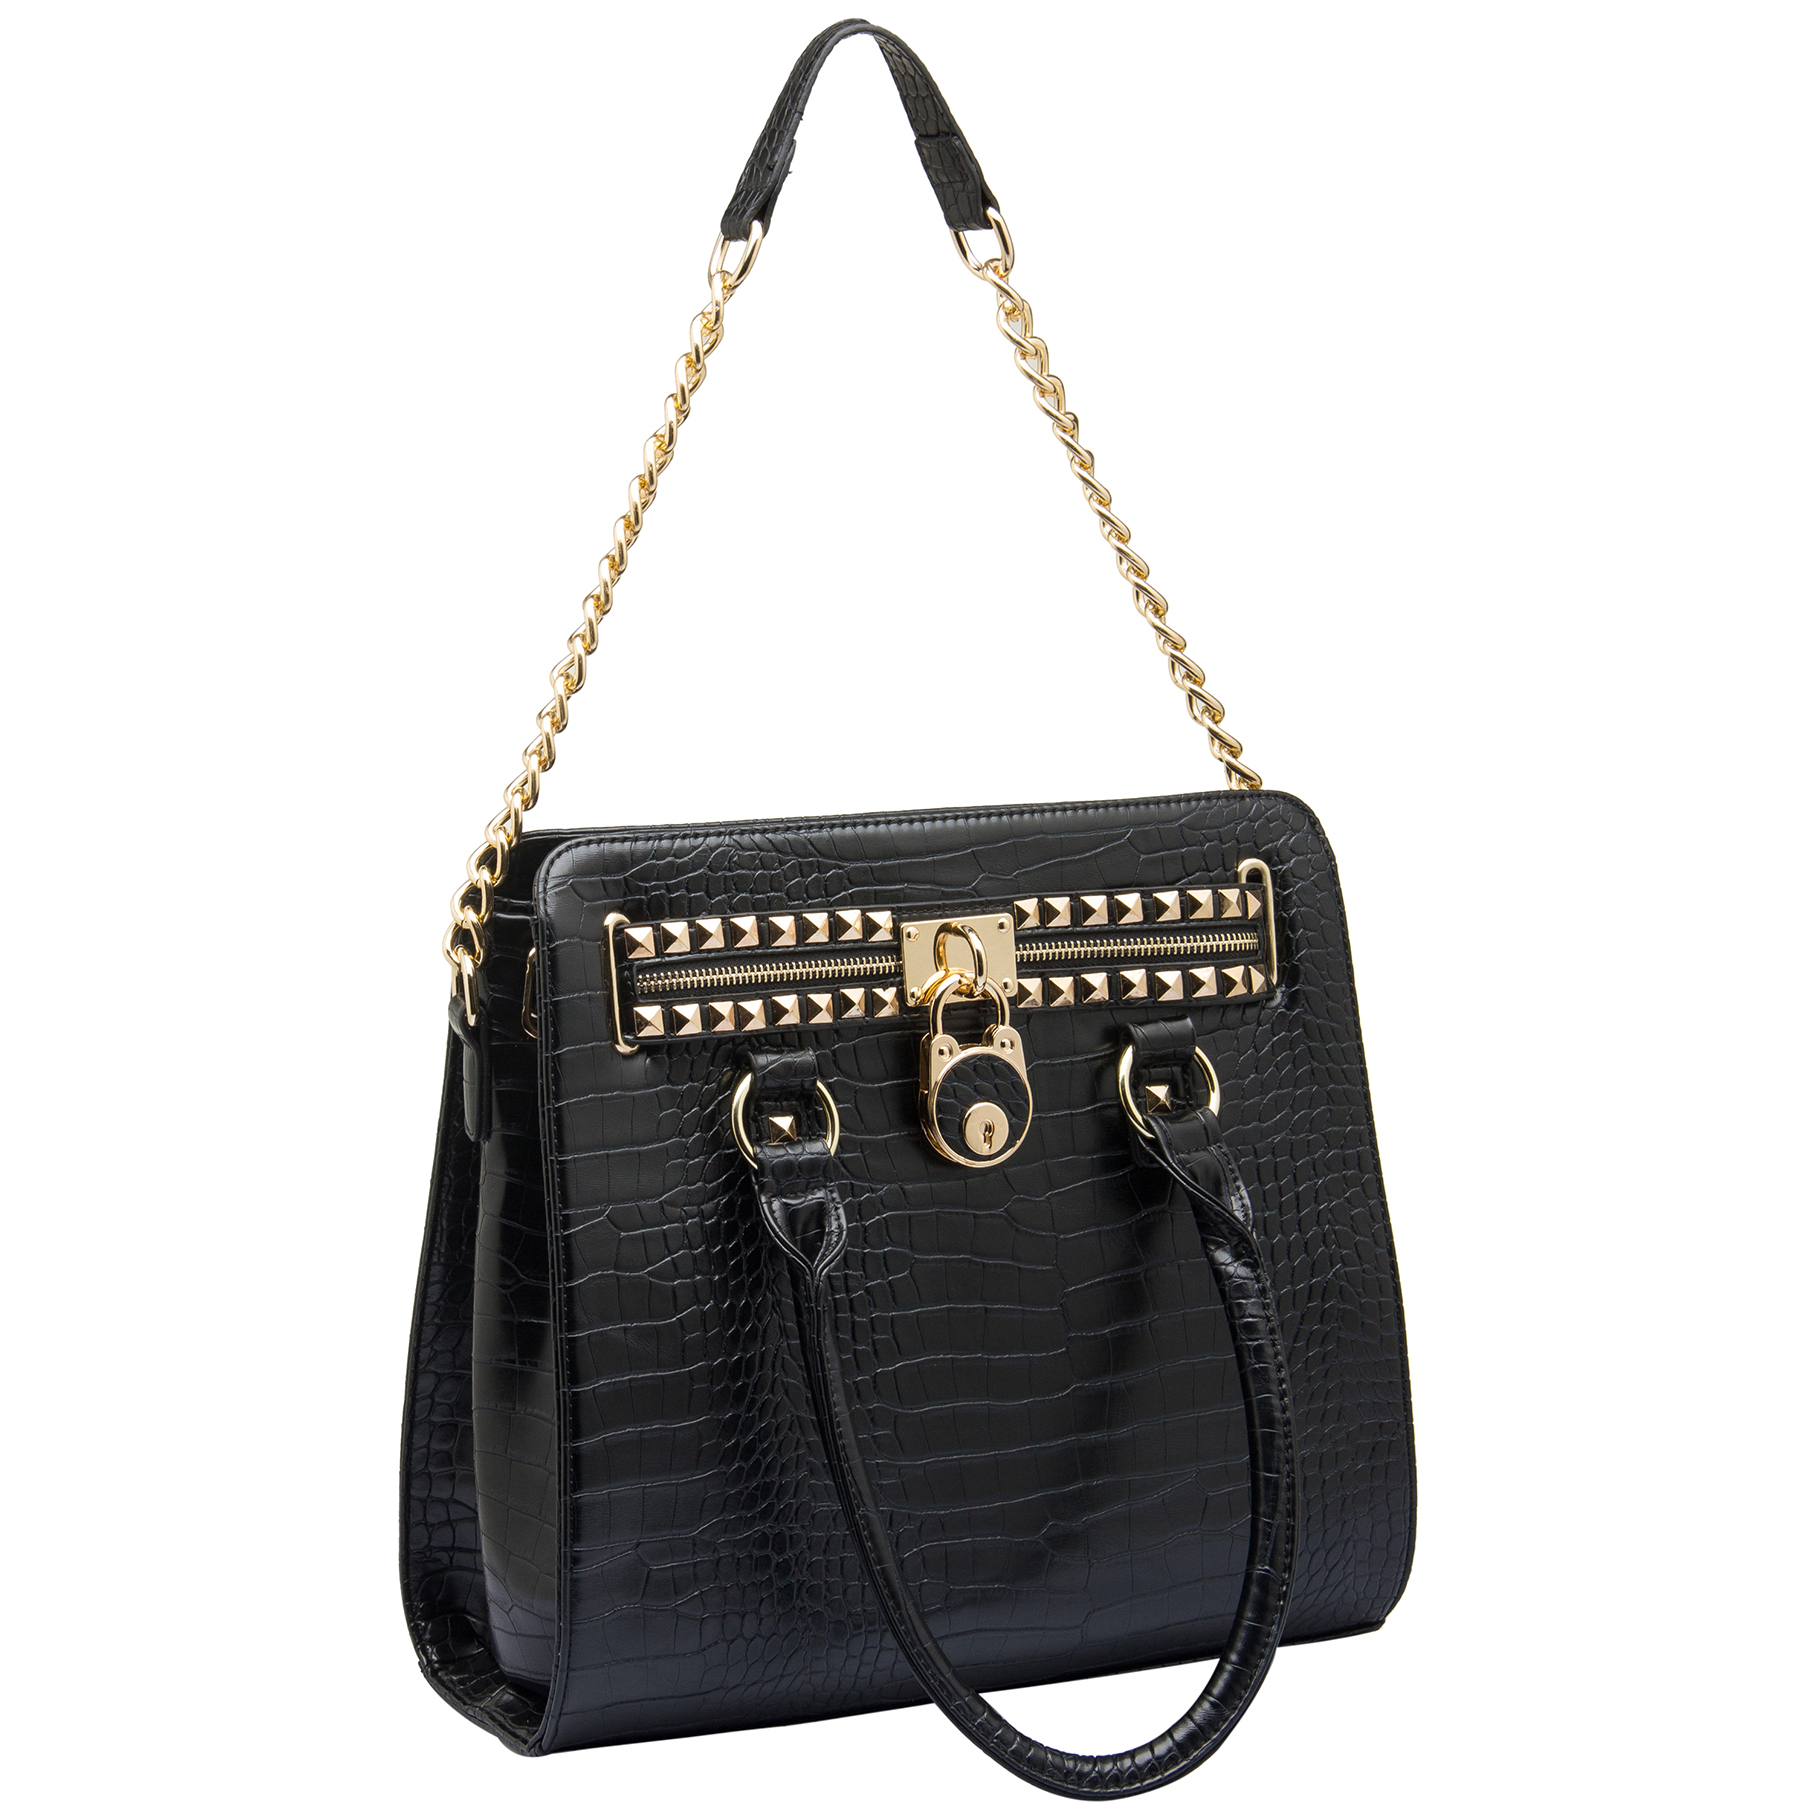 HALEY Black Crocodile Bowler Style Handbag Handle